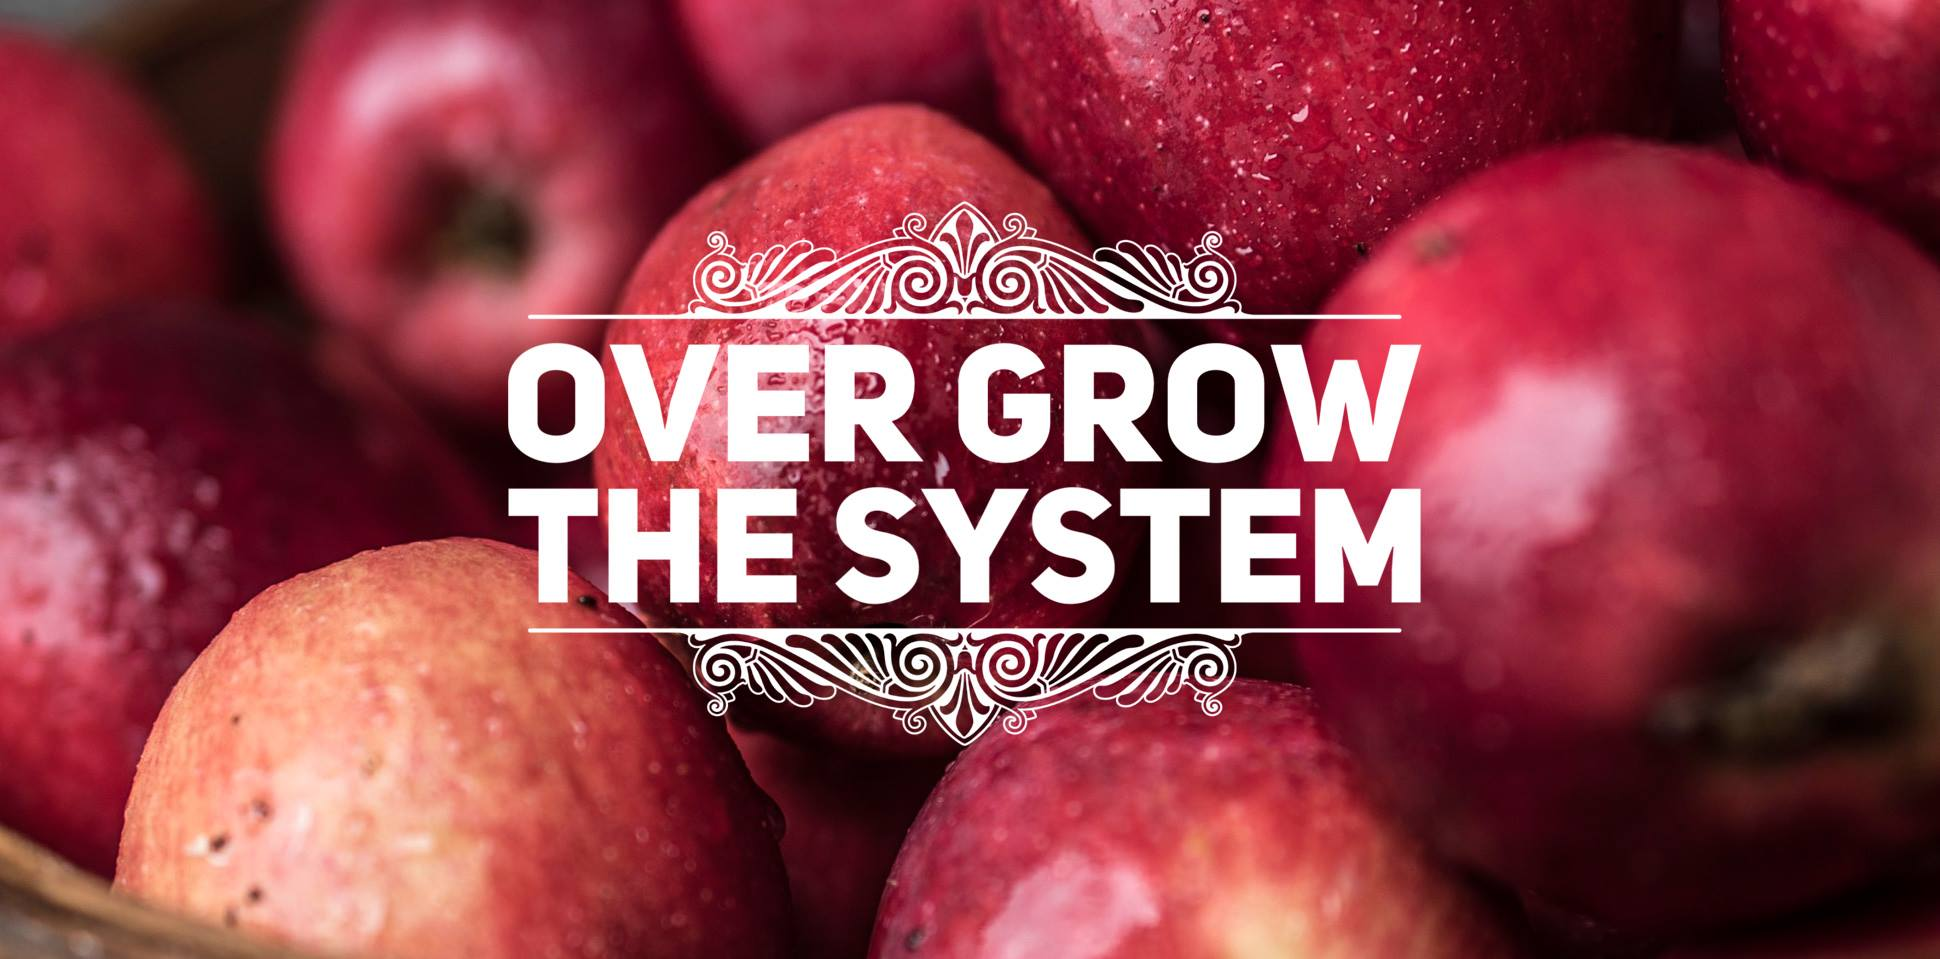 overgrow-the-system-logo.jpg